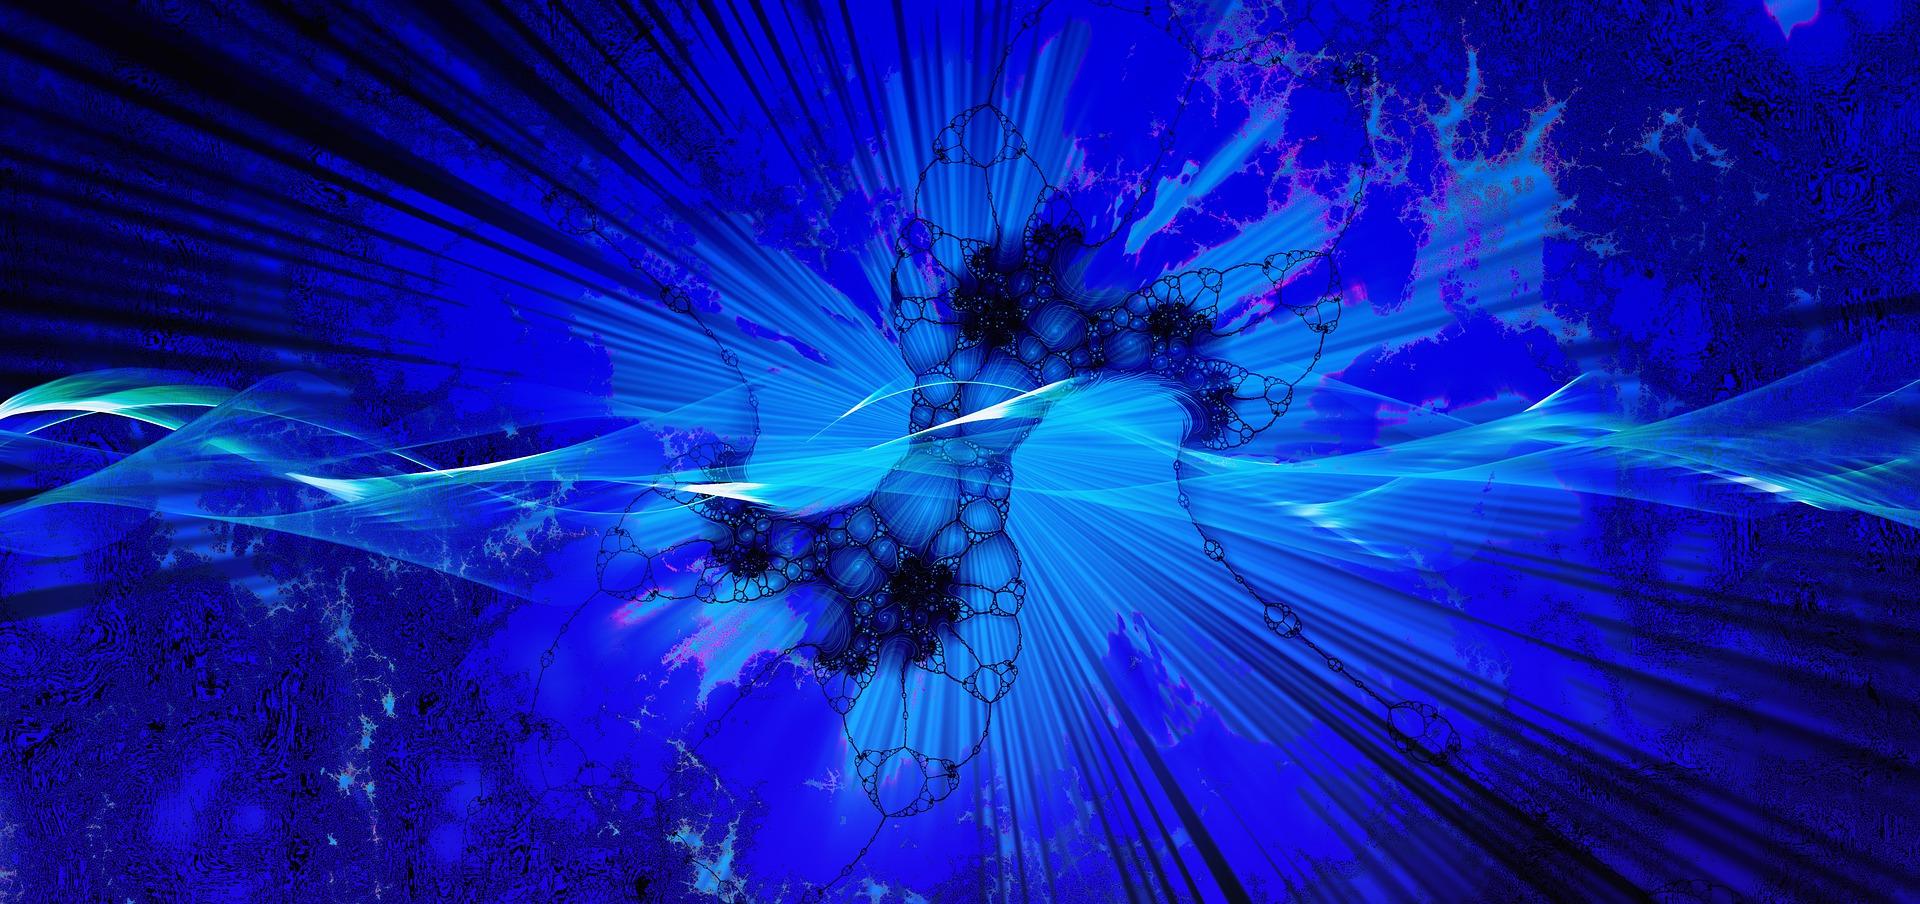 Naukovci rozrobyly novyj metod kvantovogo zv'jazku